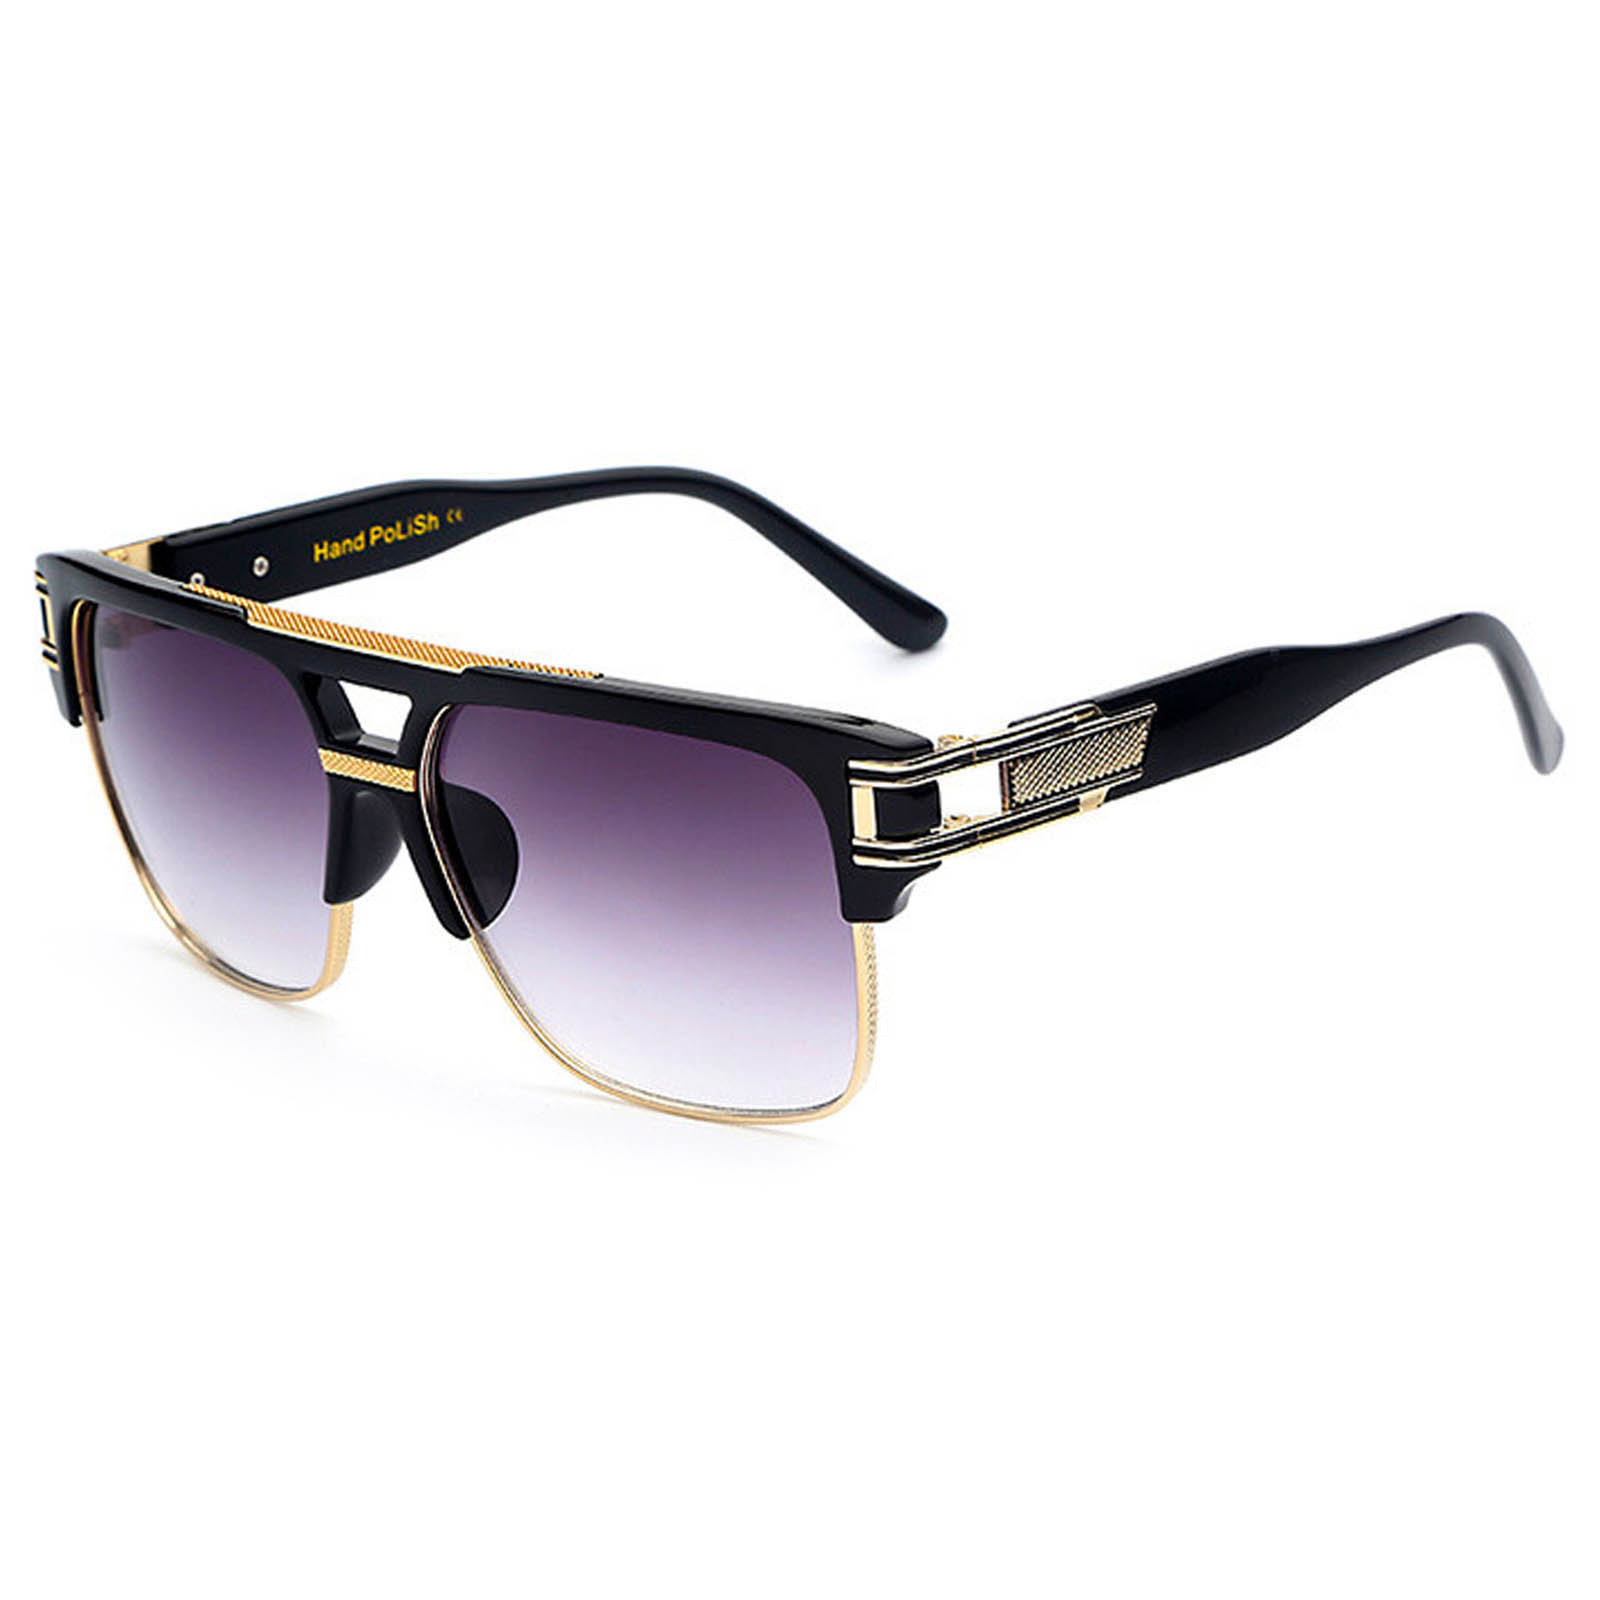 OWL ® 020 C1 Cat Rectangle Eyewear Sunglasses Women's Men's Plastic Black Frame Smoke Lens One Pair